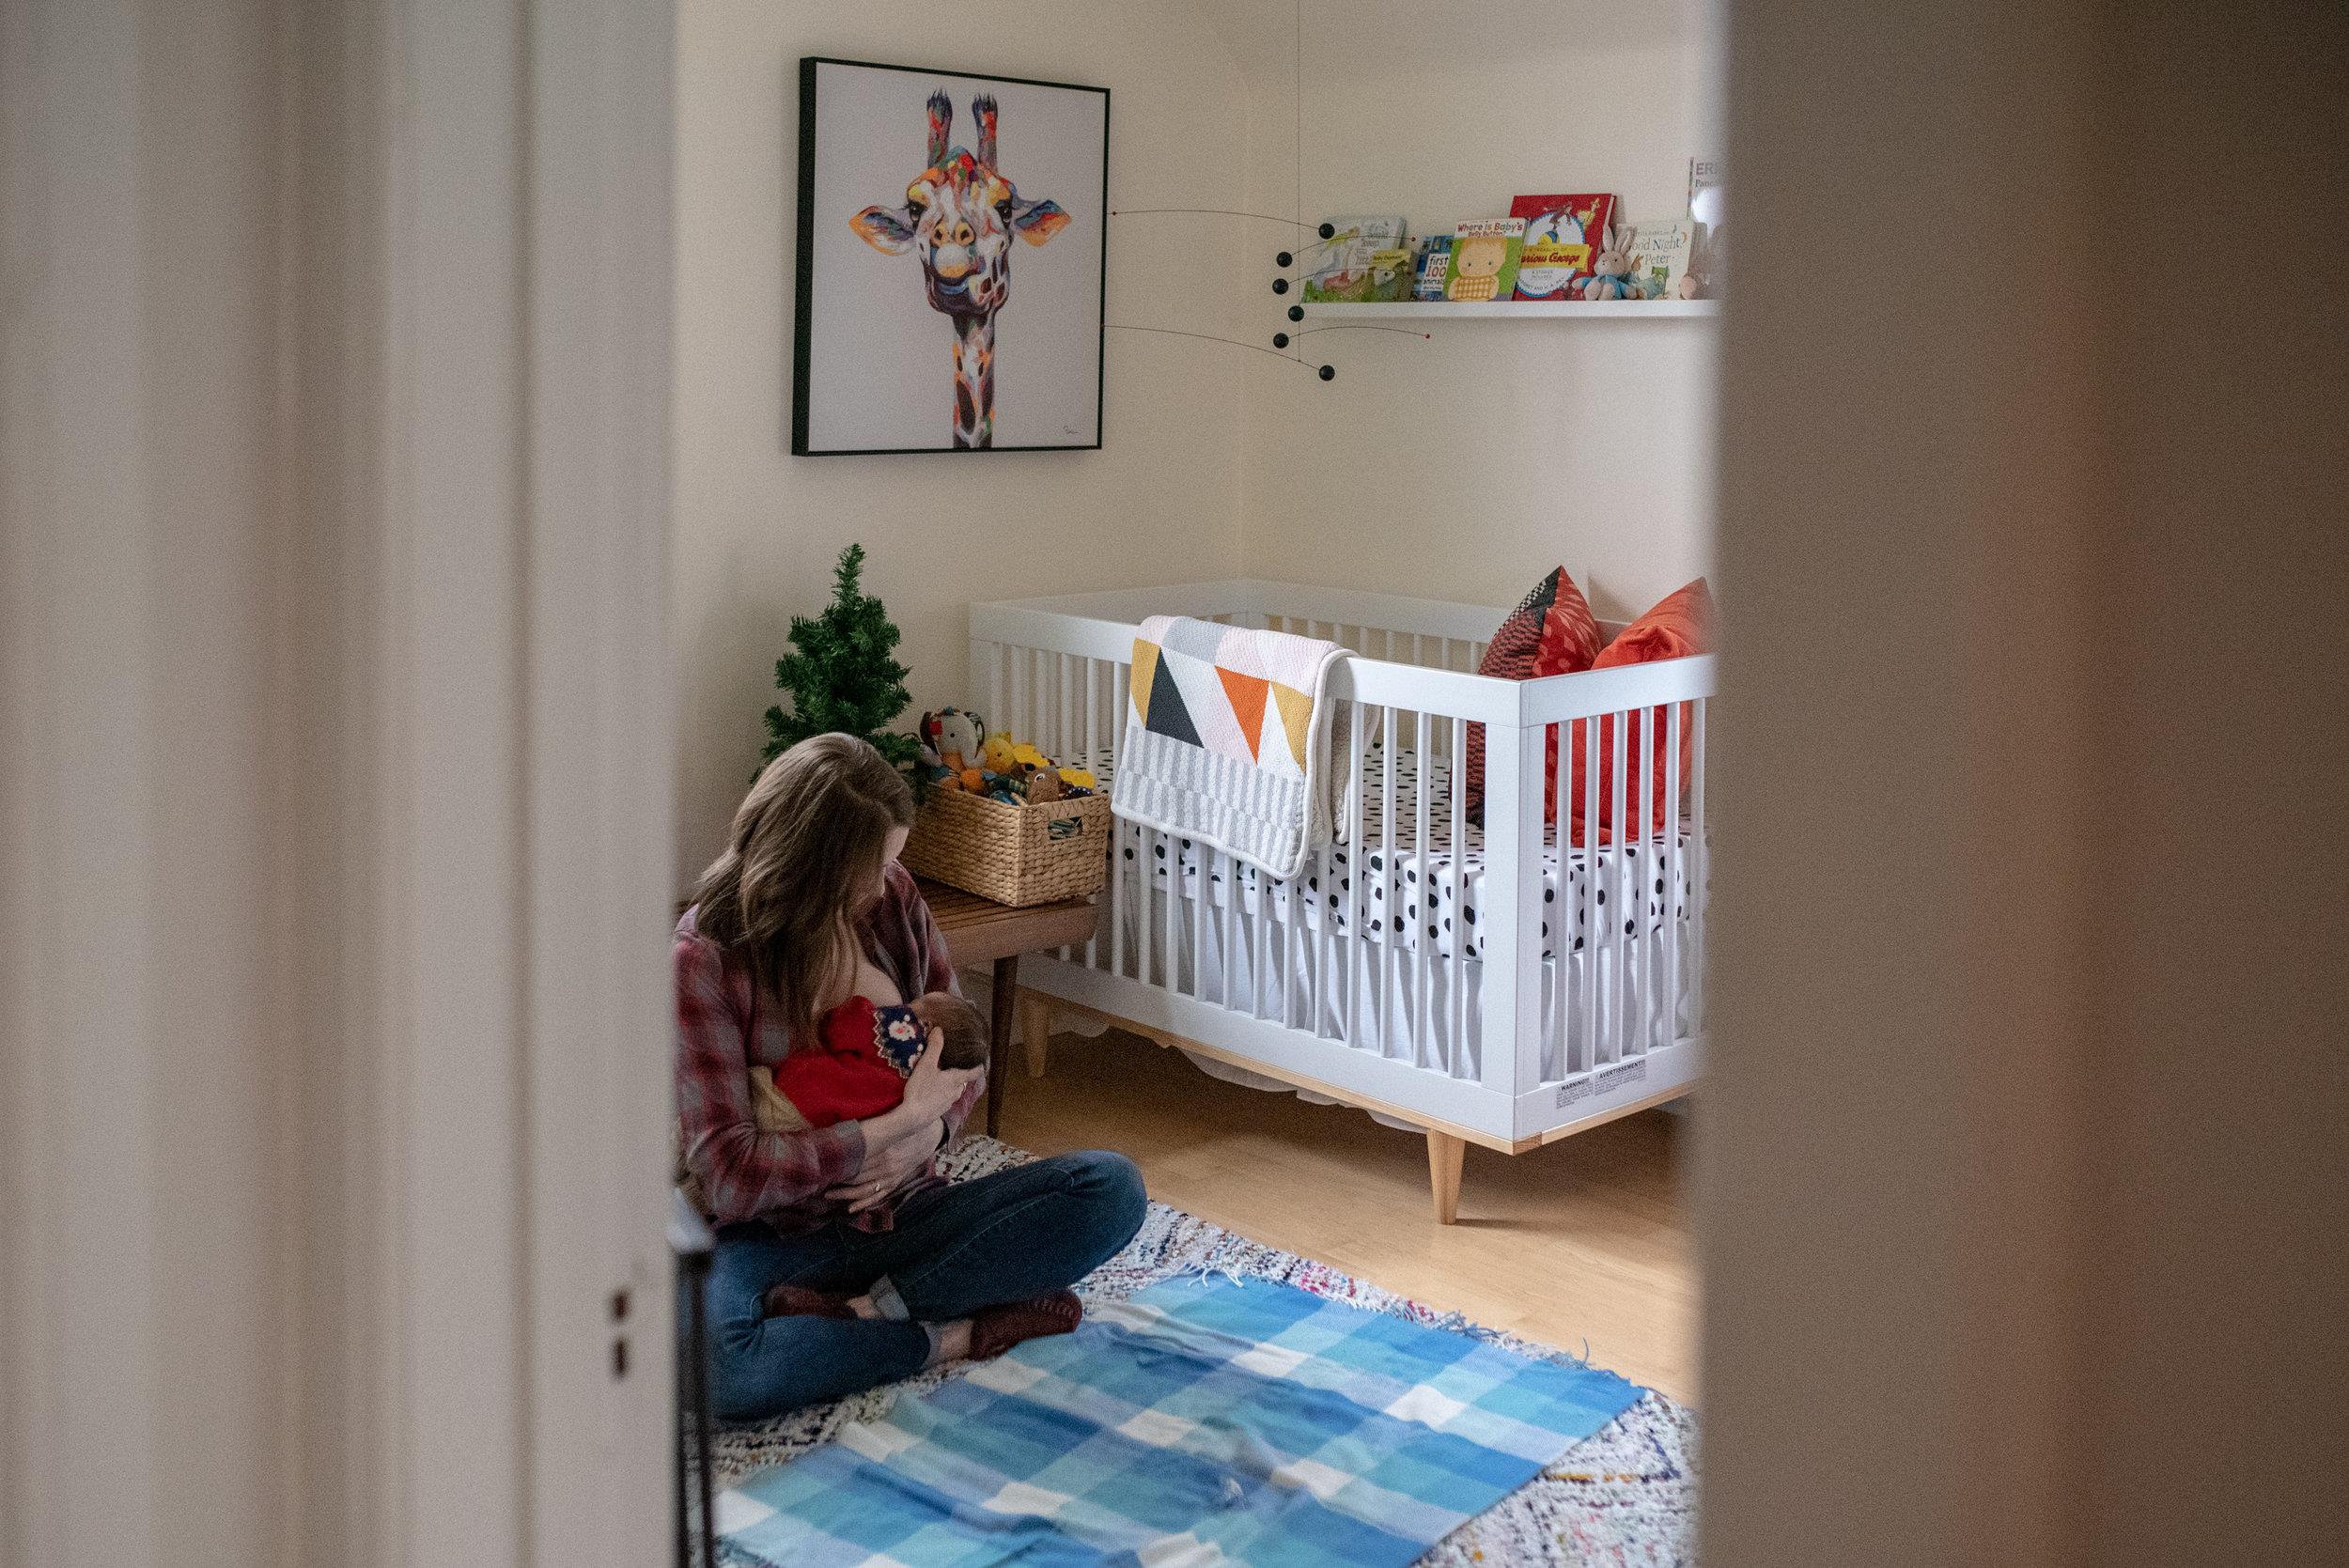 Mother sitting on the floor in babies nursery, breastfeeding baby